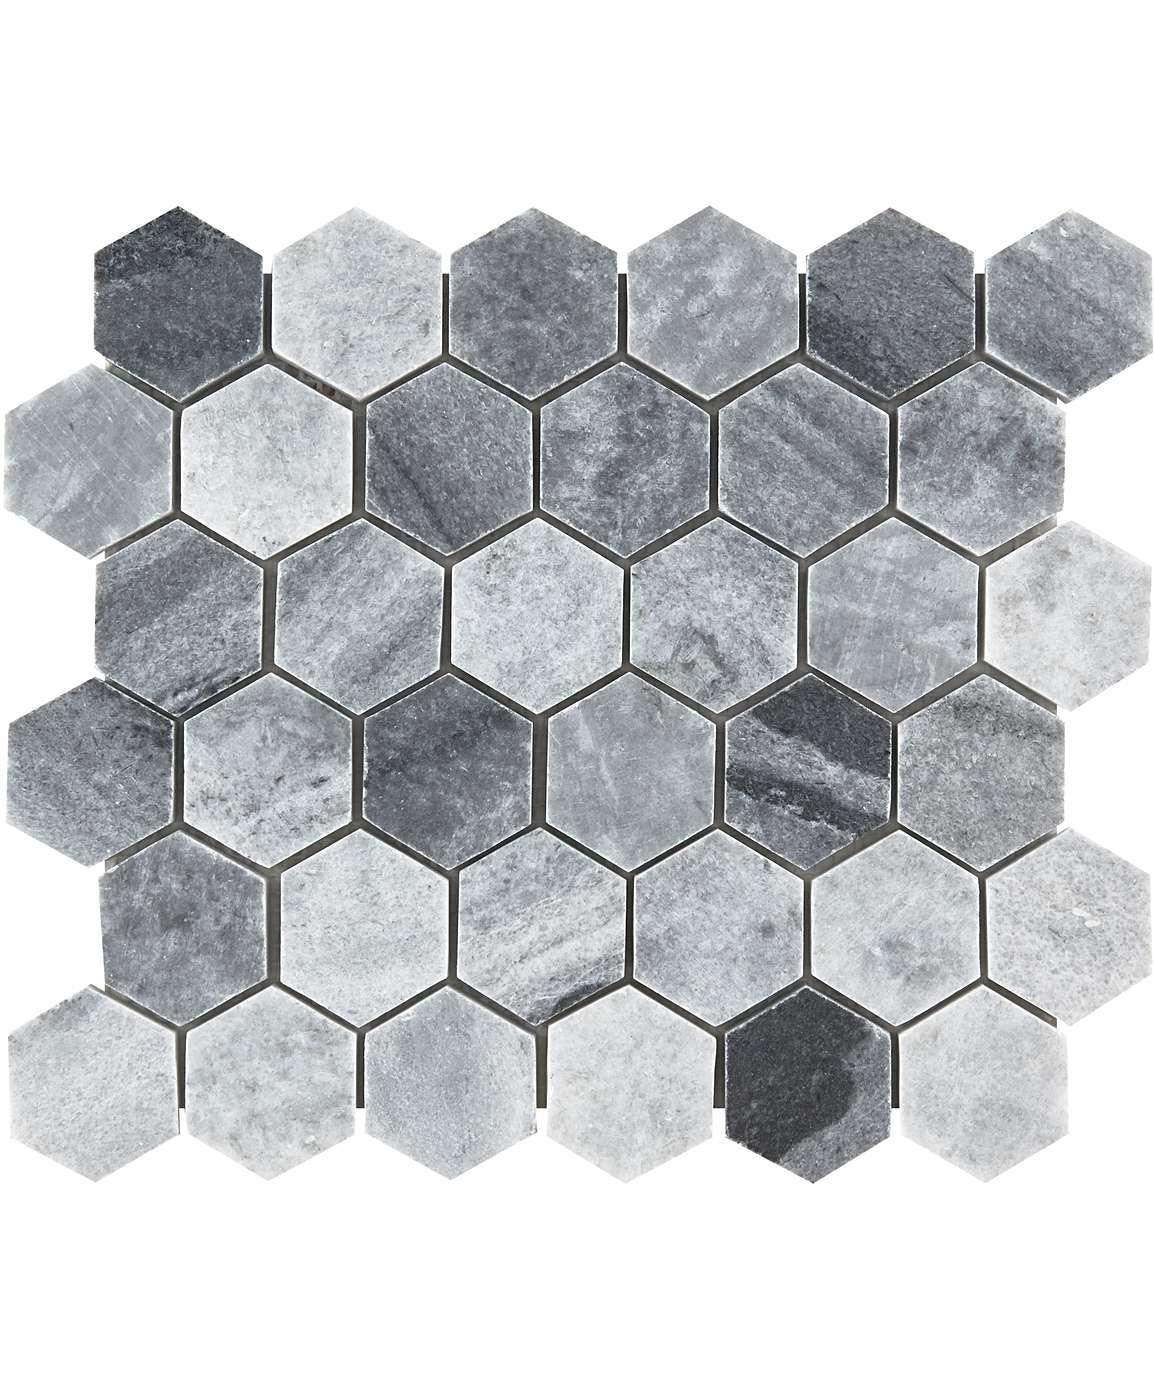 luxury tiles baltic grey polished marble hexagon mosaic wall and floor tile